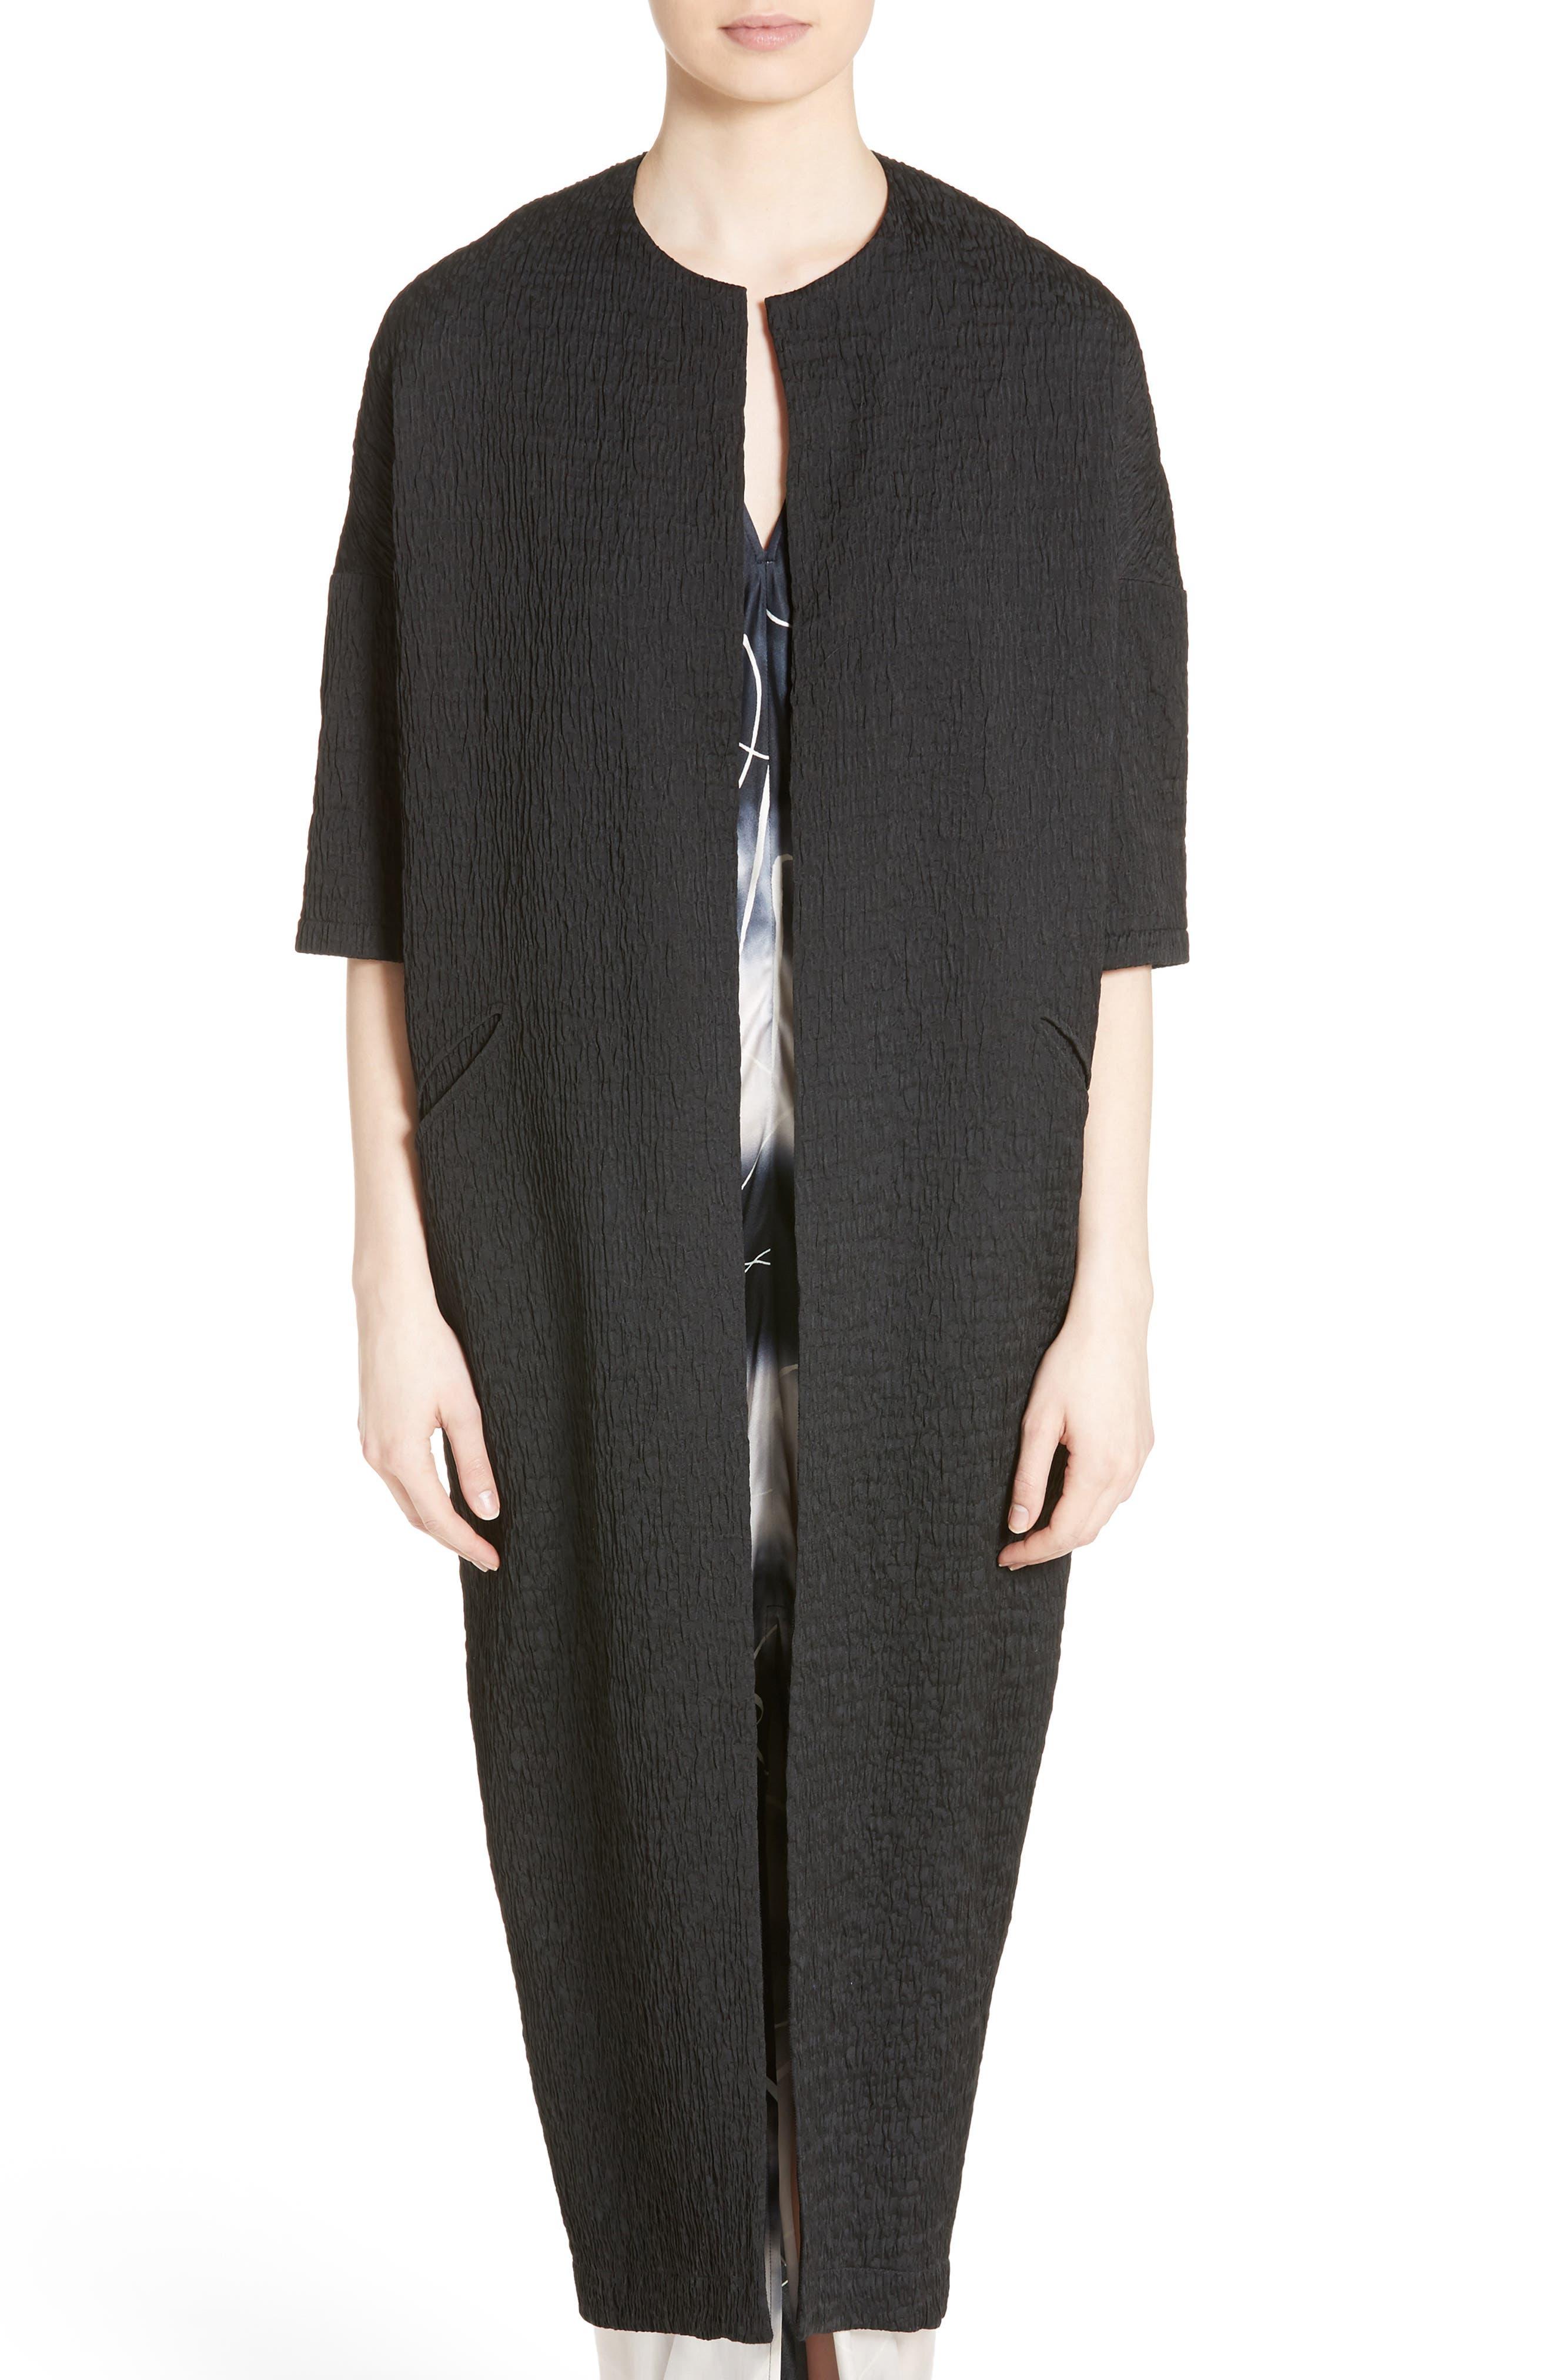 Koya Crinkle Stretch Coat,                         Main,                         color, Black